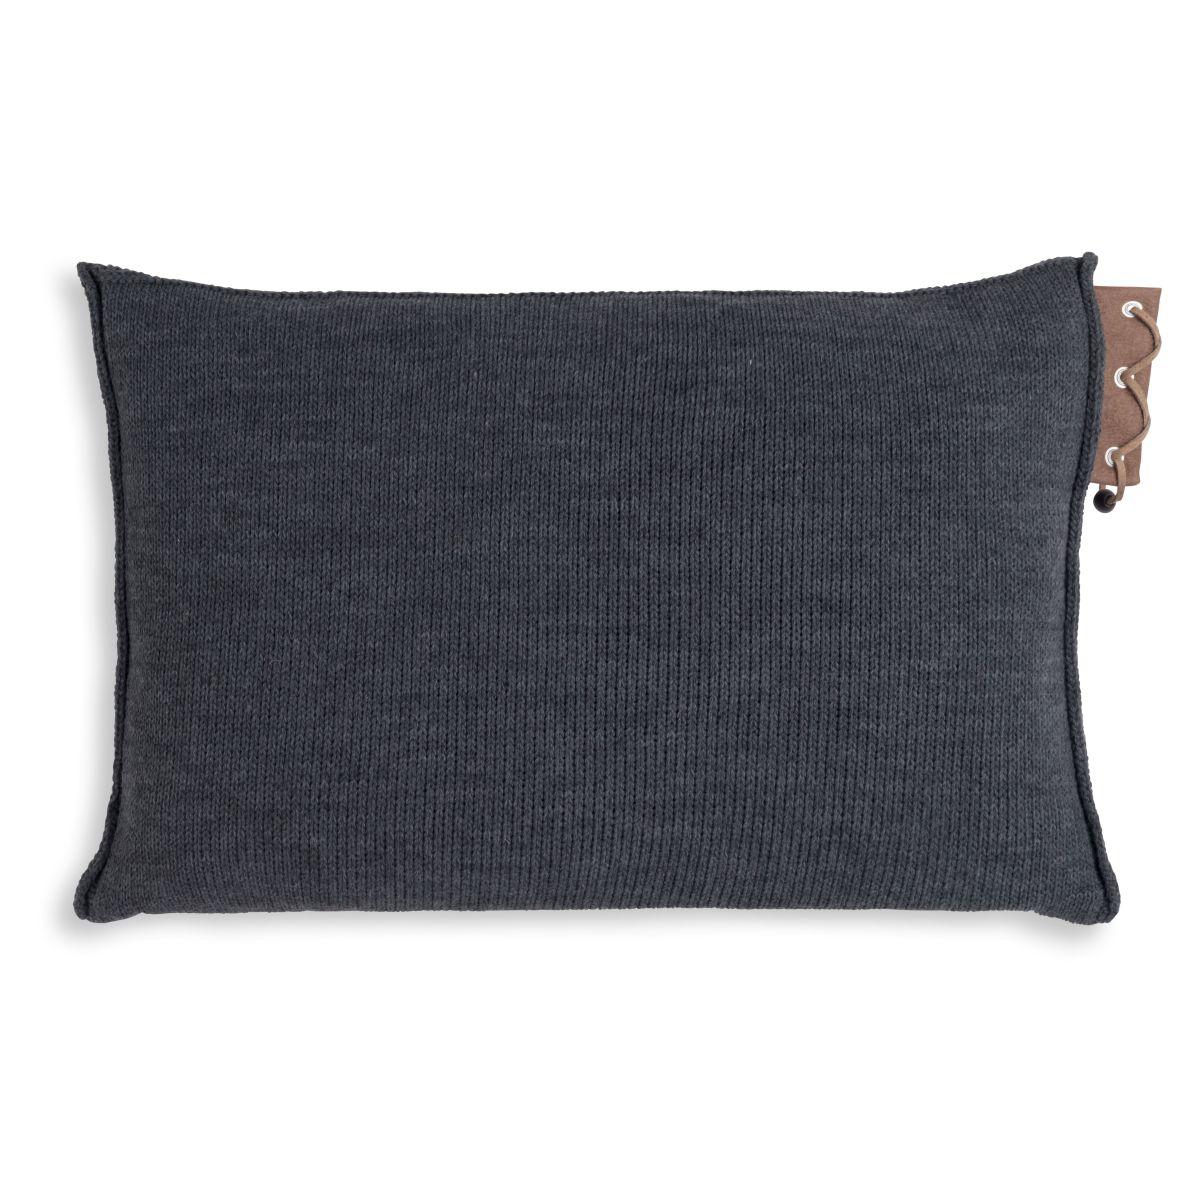 knit factory 1341310 jay kussen 60x40 antraciet 2